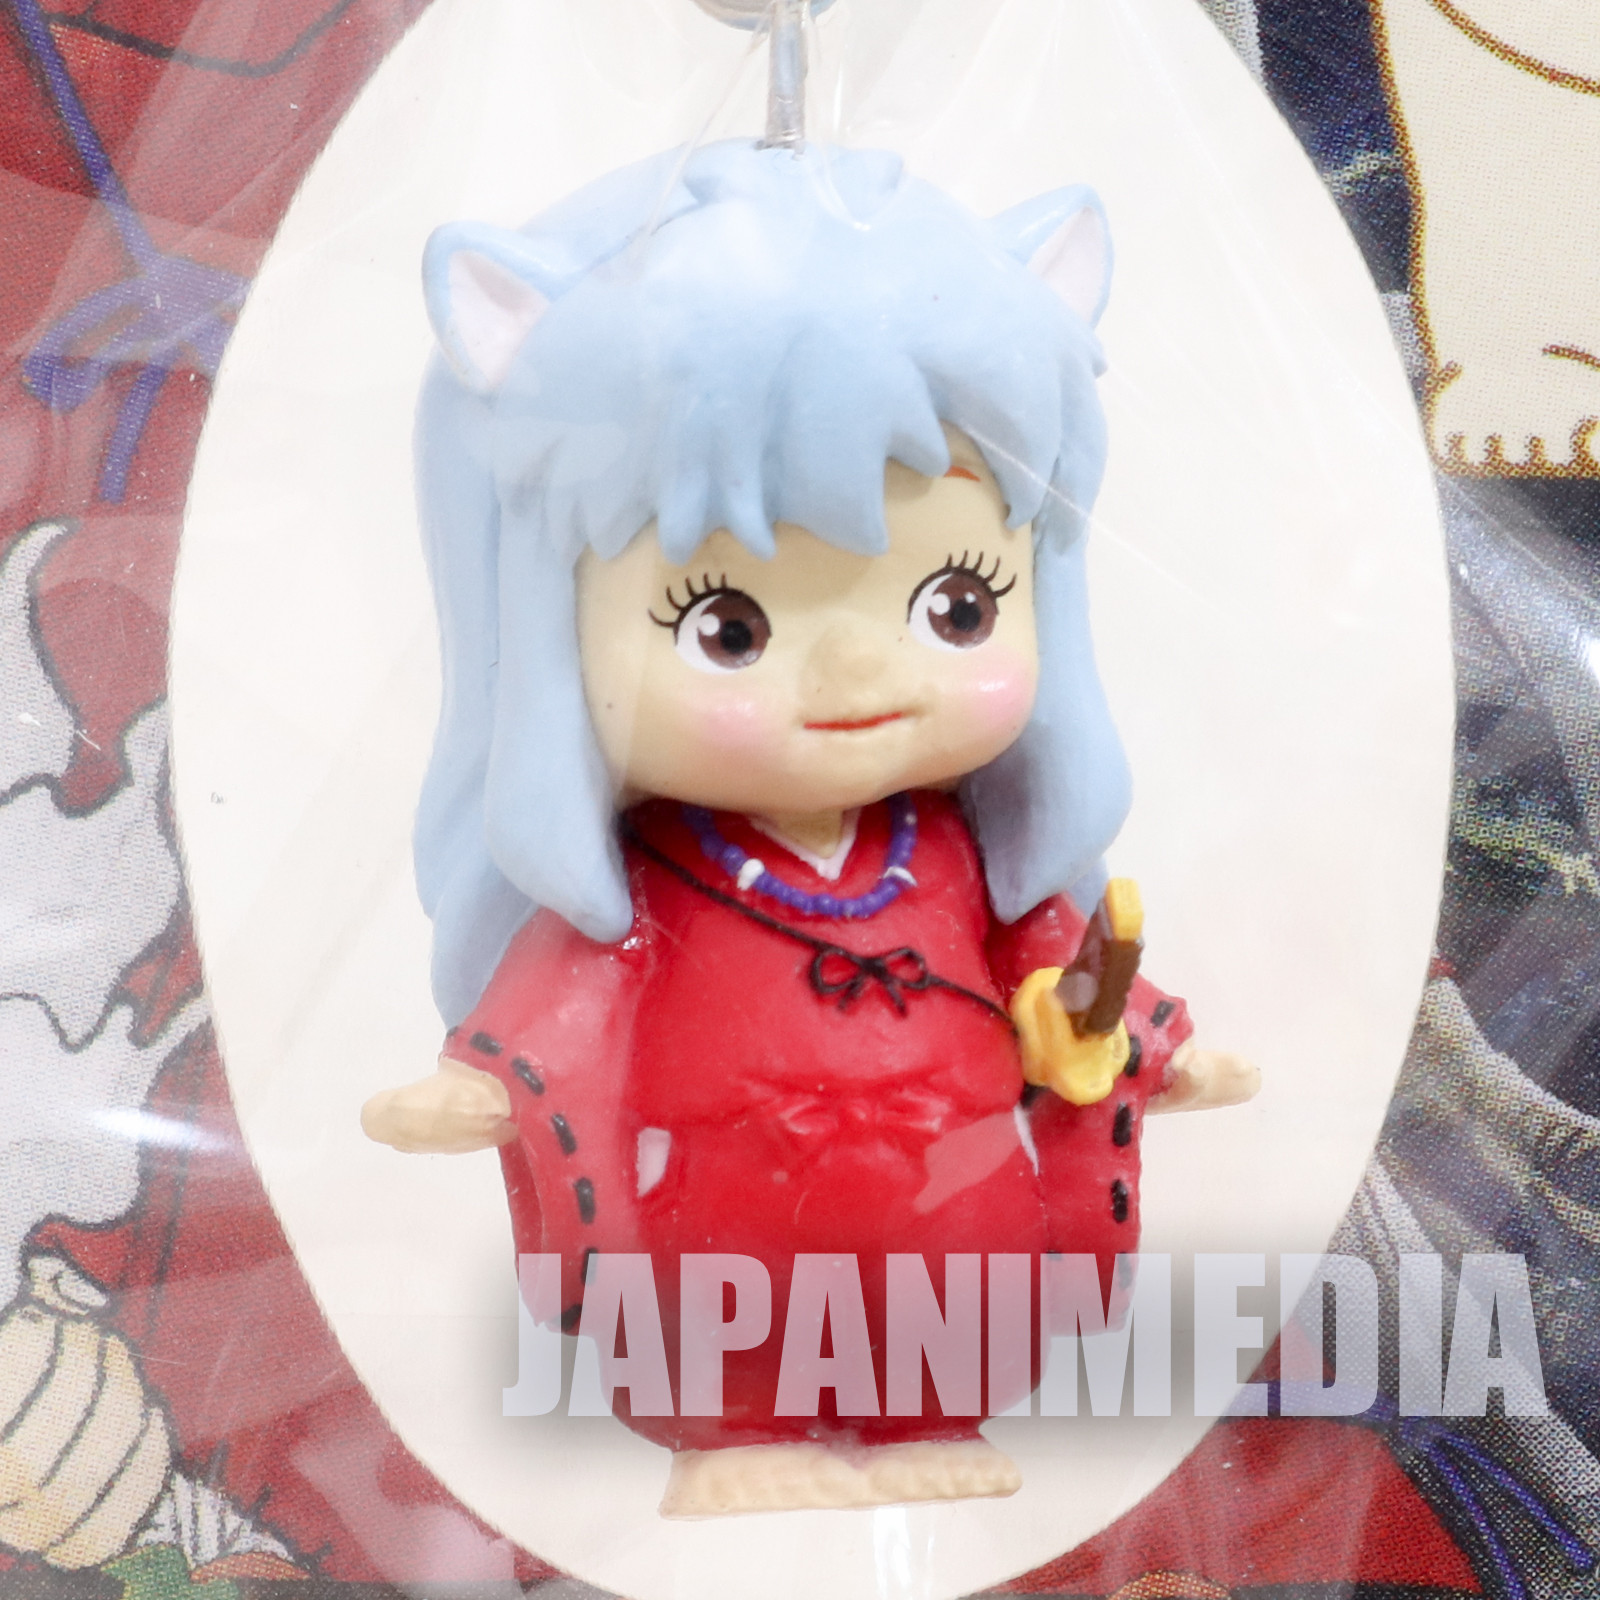 RARE! Inuyasha Rose O'neill Kewpie Kewsion Strap JAPAN ANIME MANGA 2